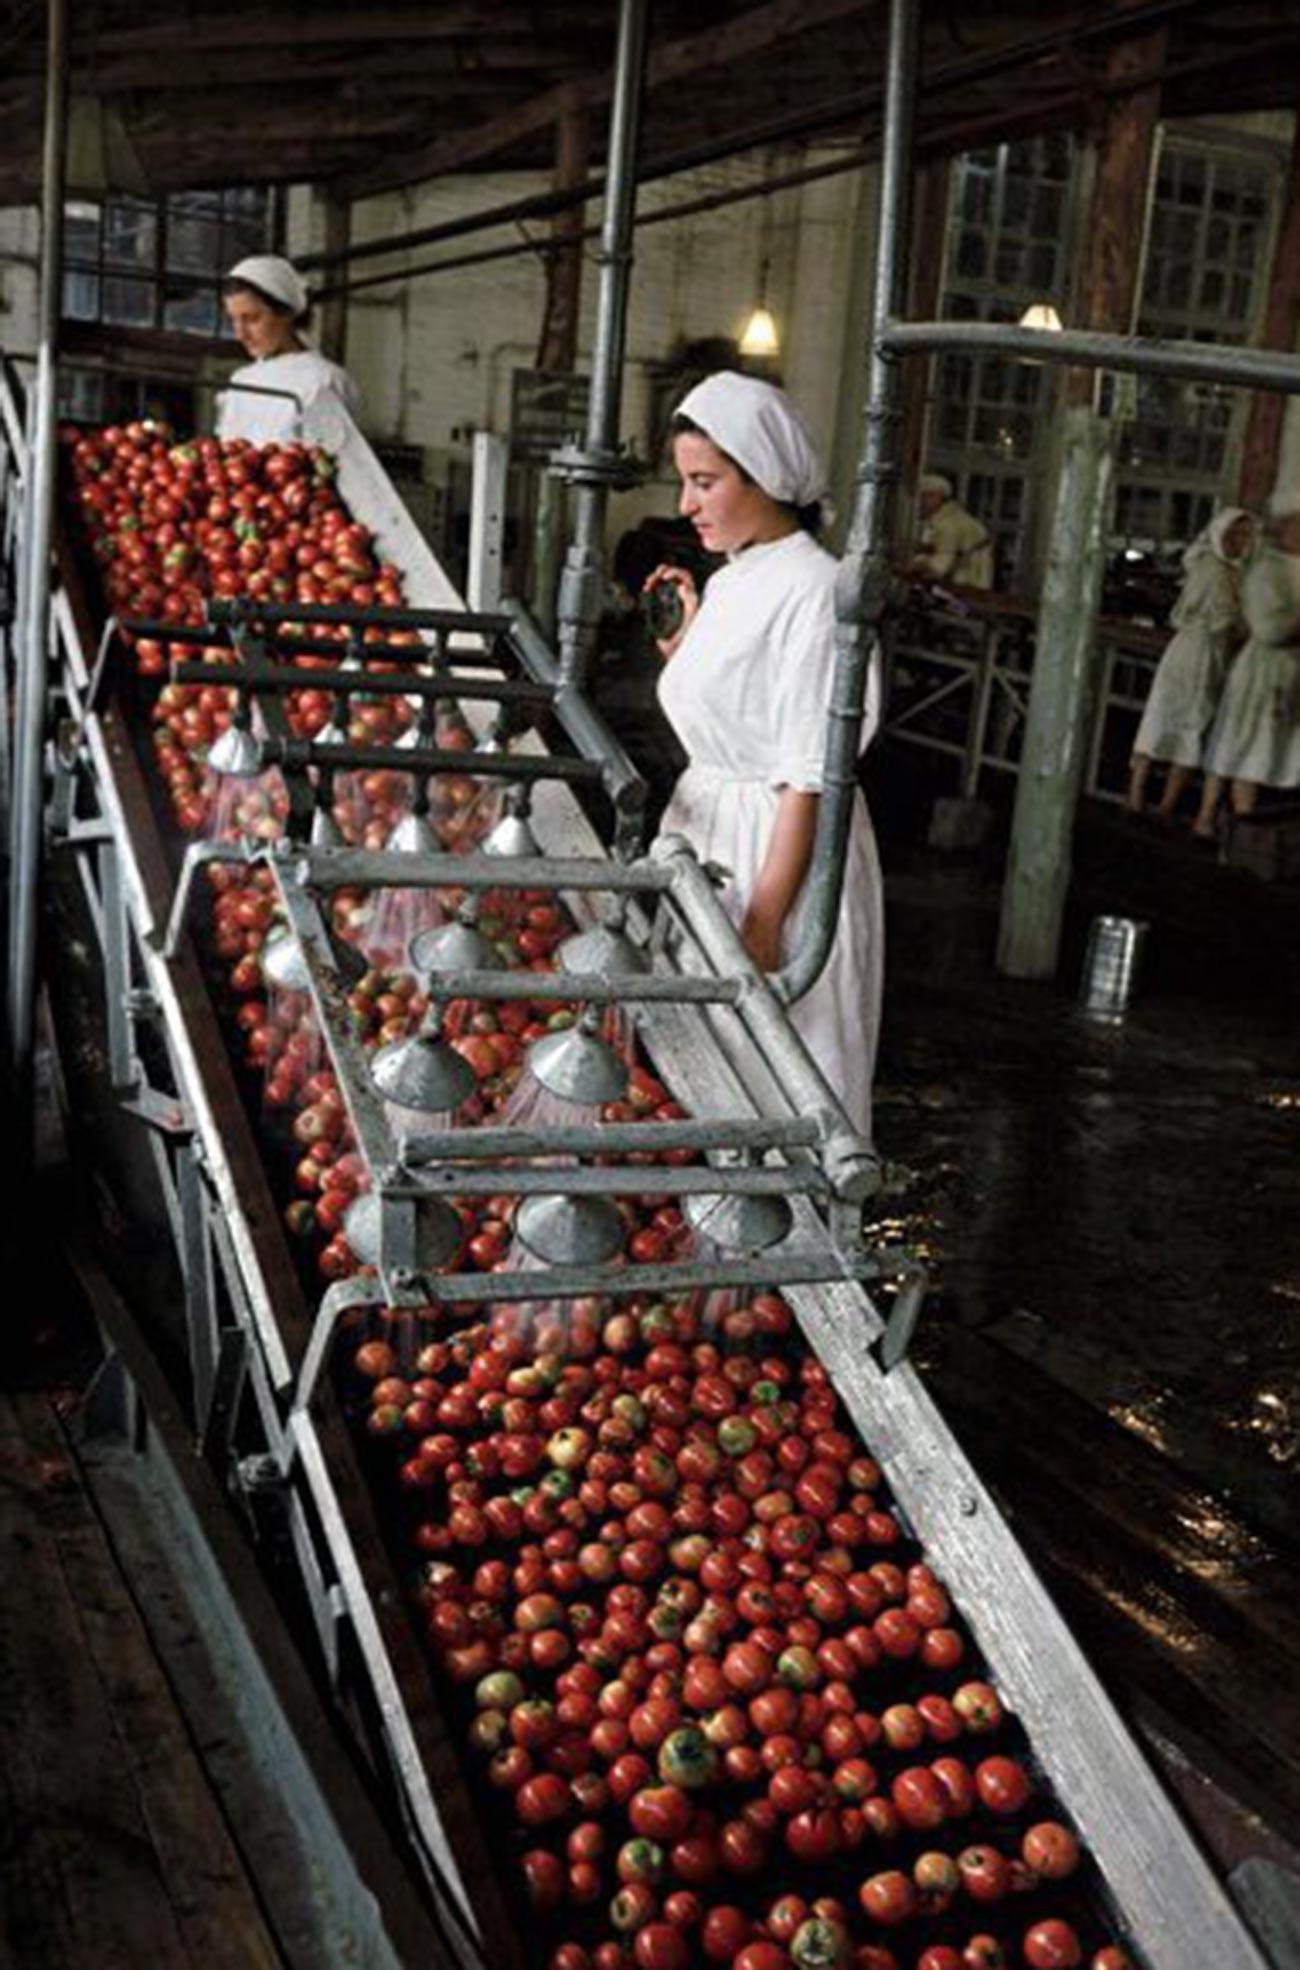 Tomatoes at the May 1st Tiraspol canning factory, 1953